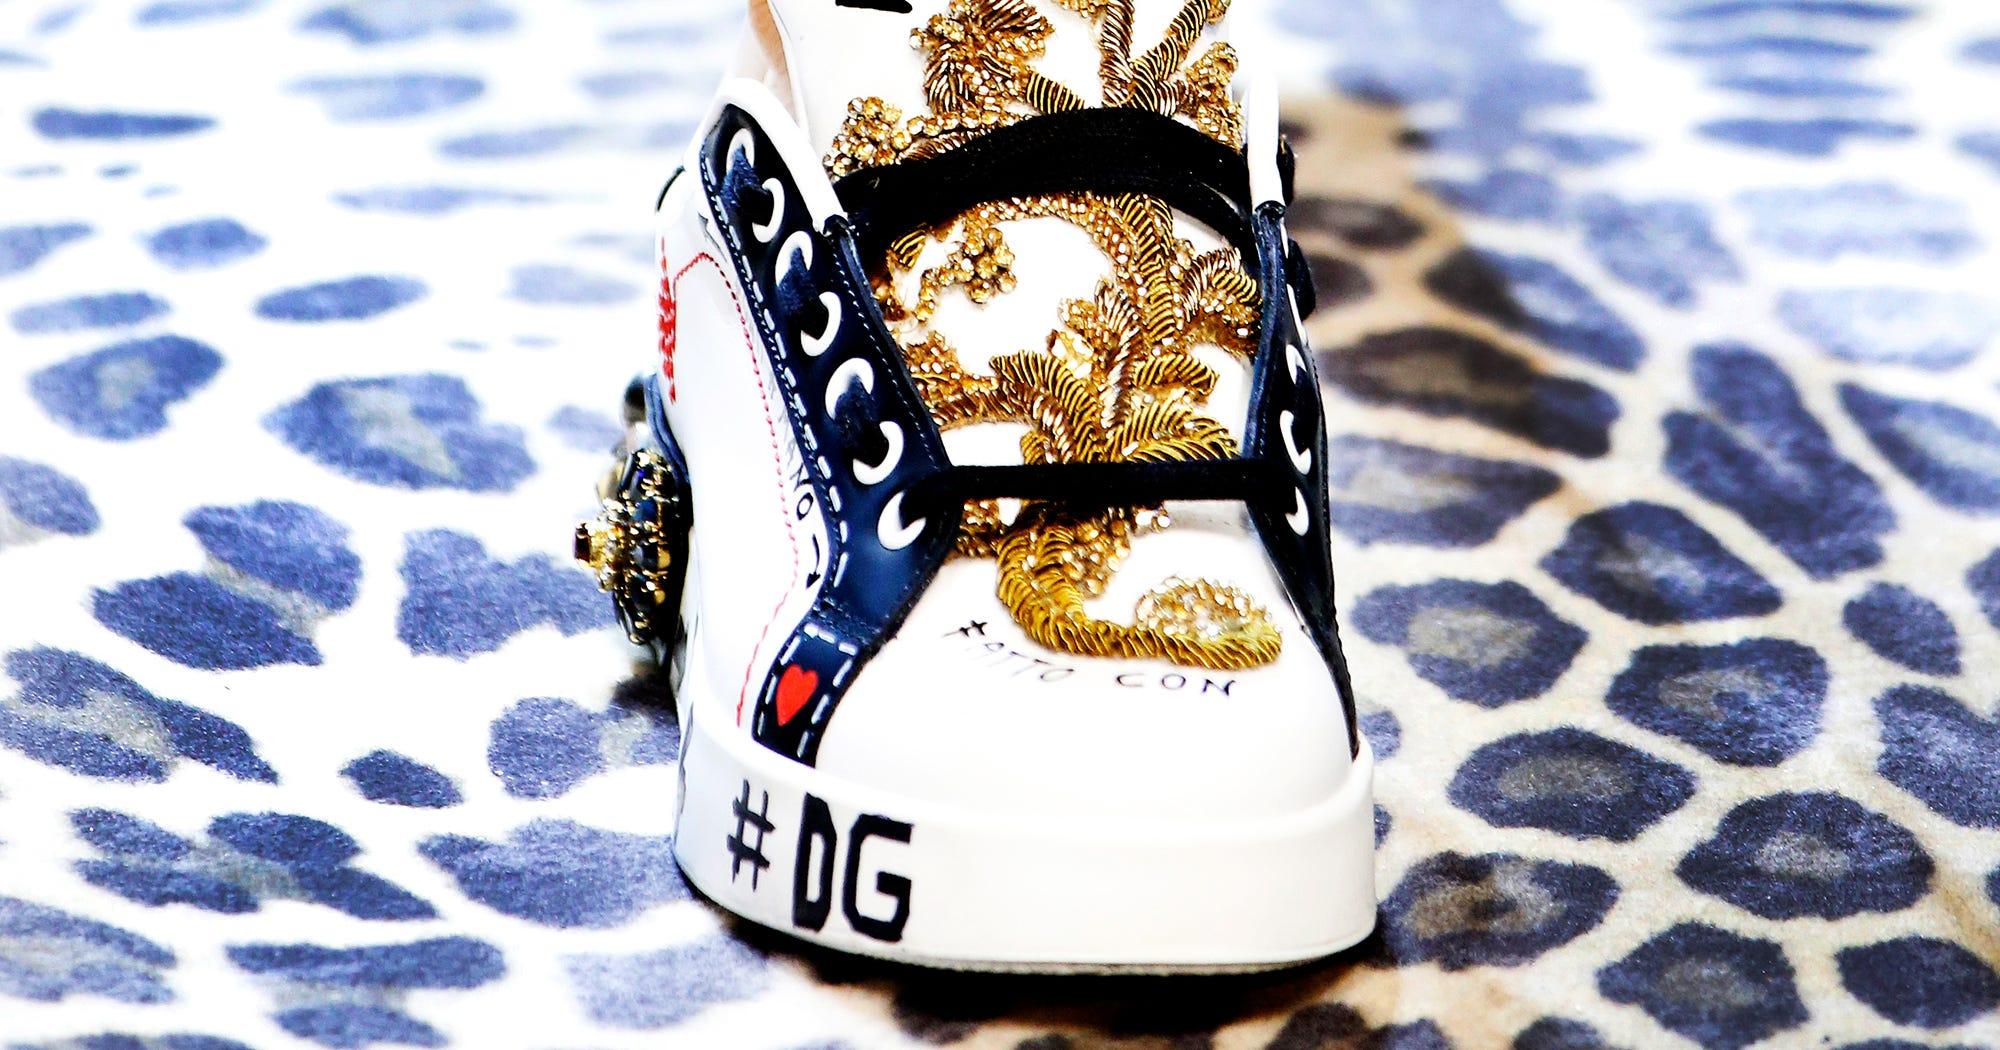 Sneaker Gabbana Dolce Backlash Gorgeous Fall 2017 Thin 3Rjq54AcL